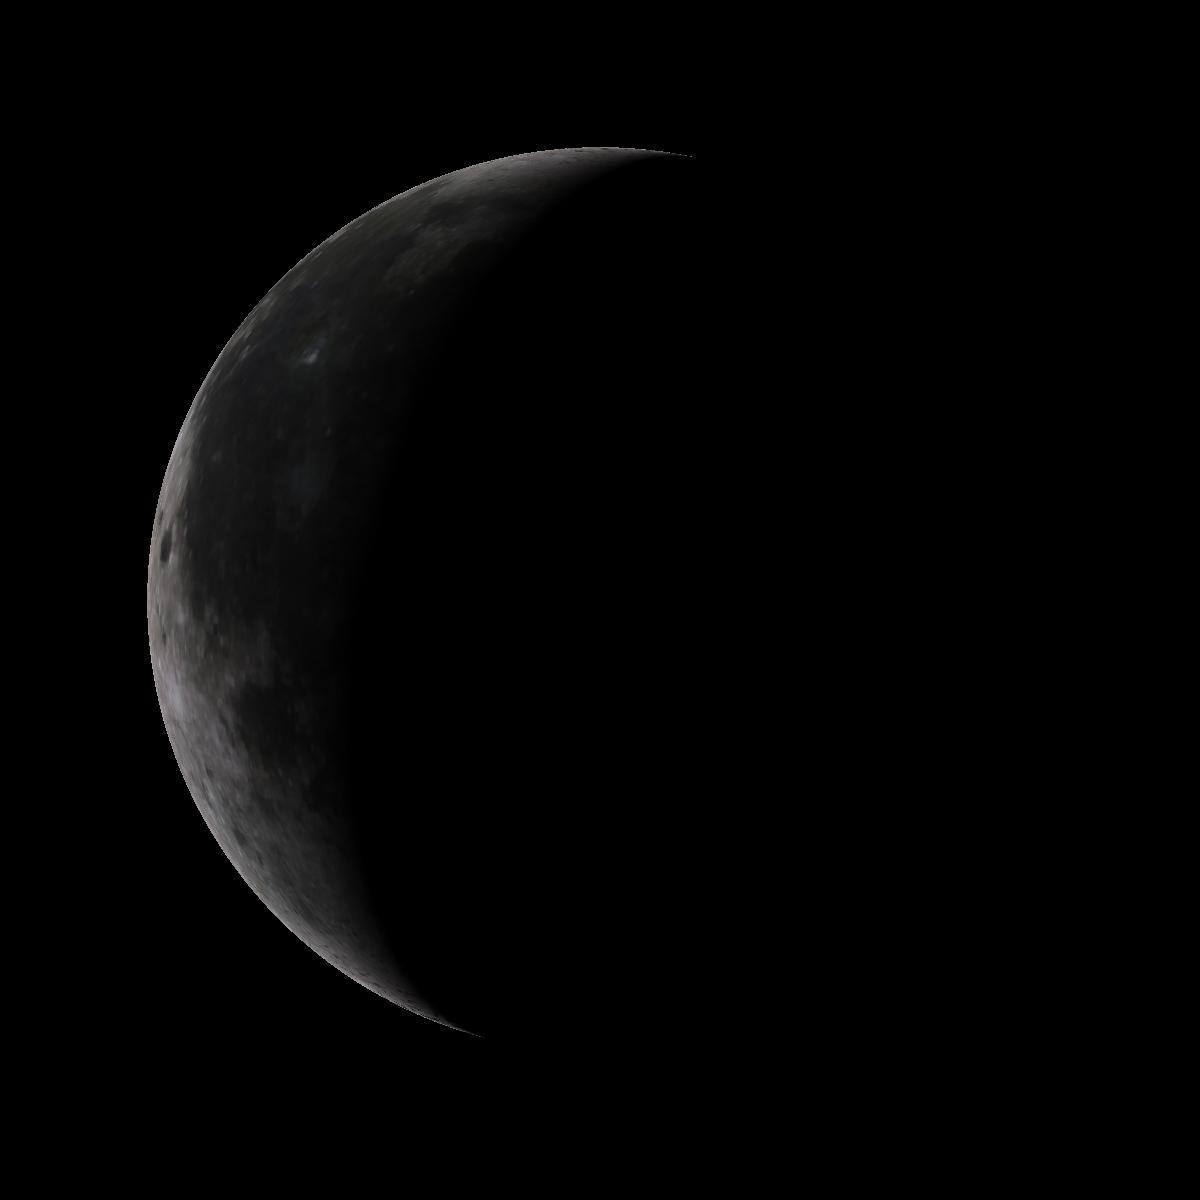 Lune du 19 mars 2020